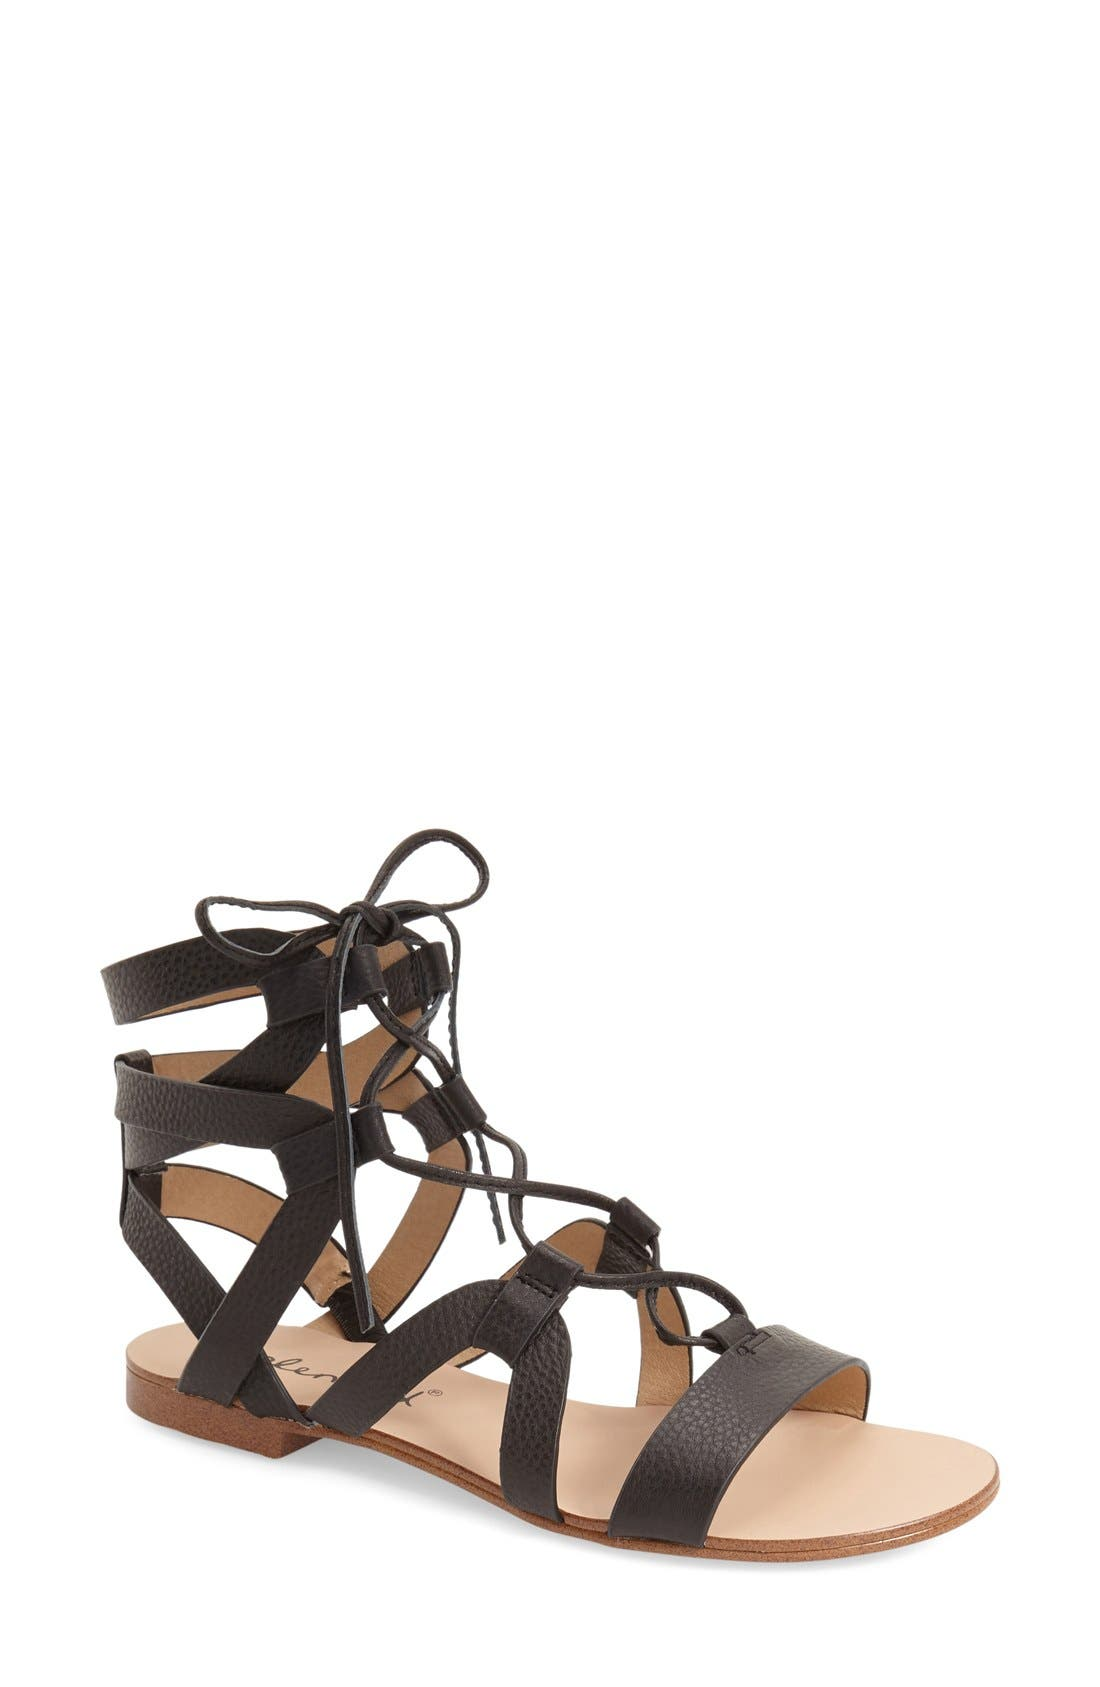 SPLENDID, 'Cameron' Lace-Up Sandal, Main thumbnail 1, color, 001